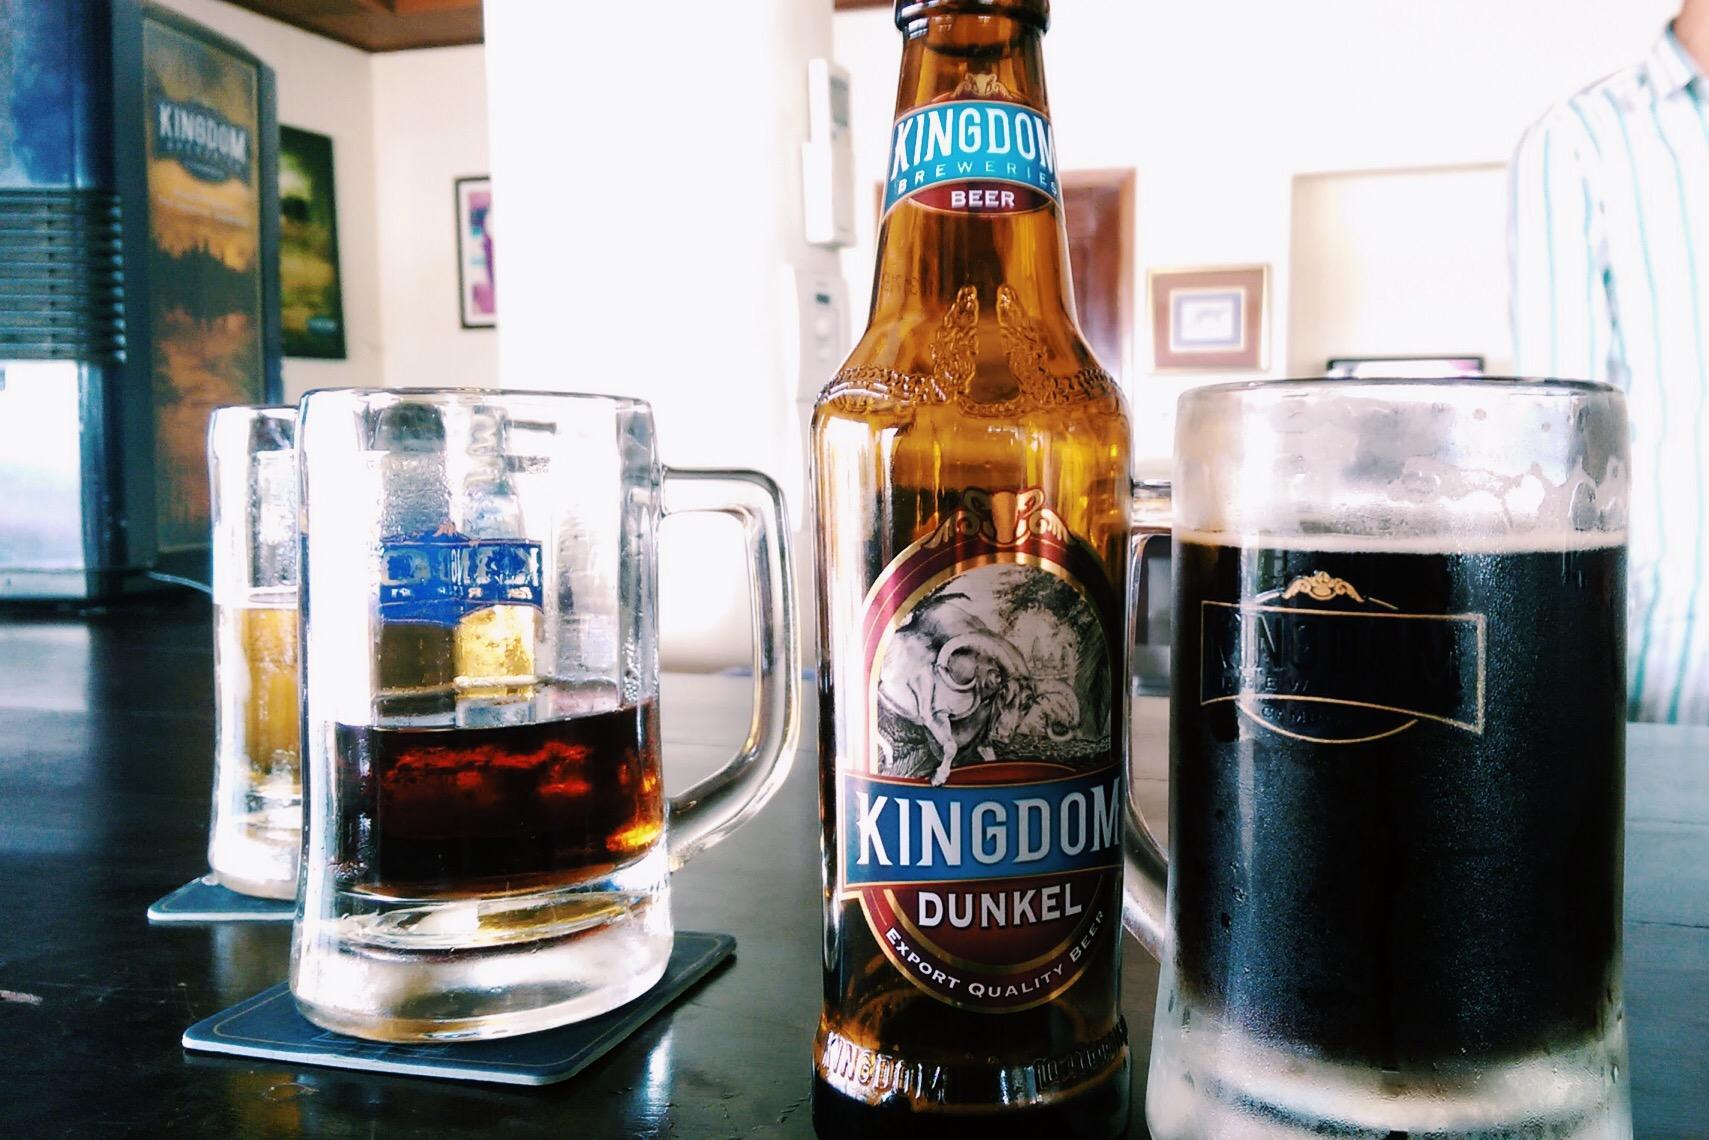 Kingdom breweries cambodia Phnom Penh